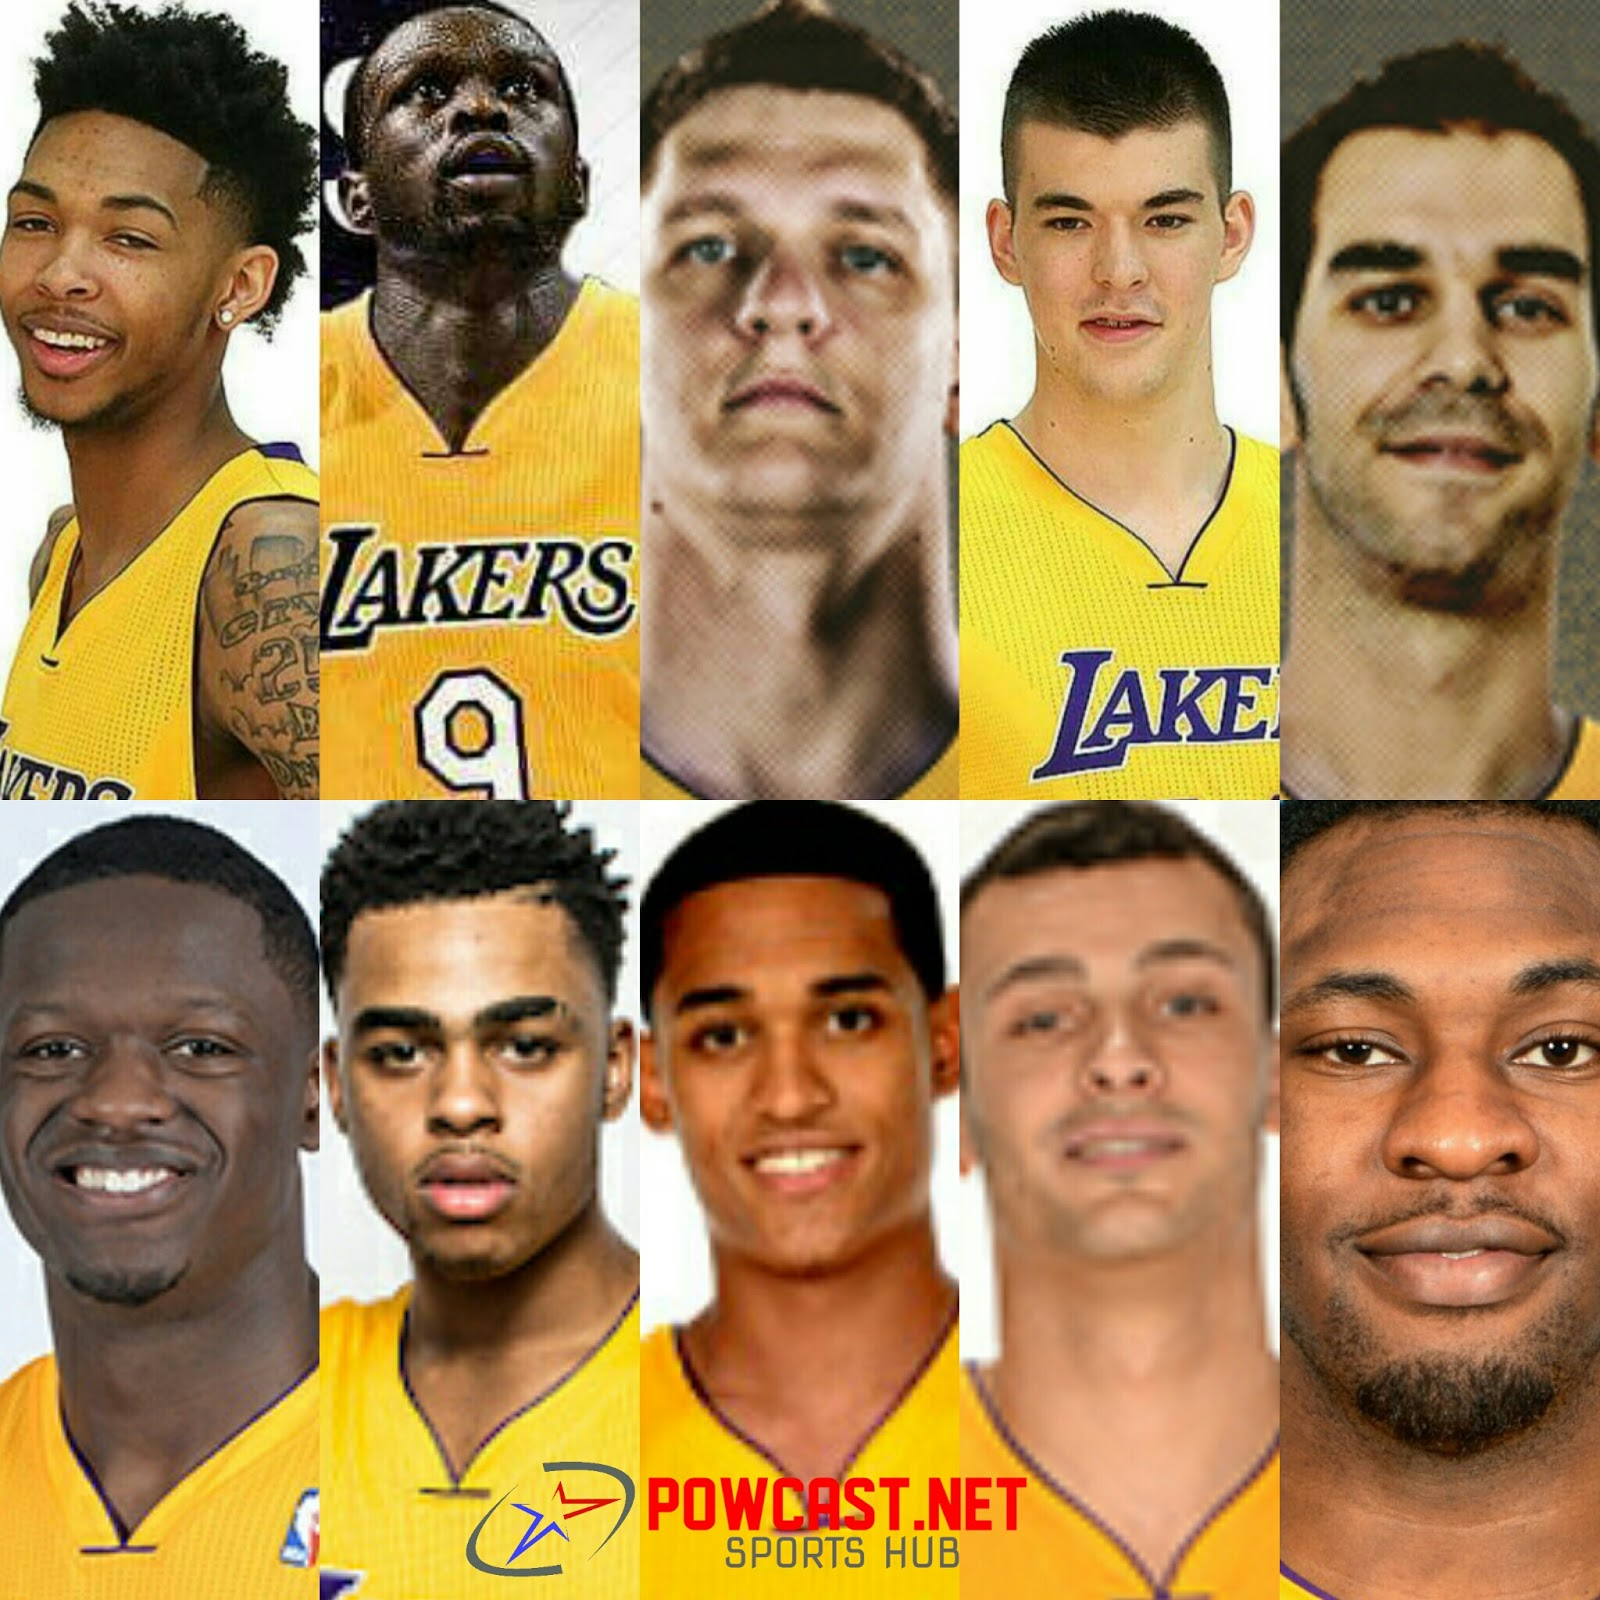 La Lakers Pow Salud Studio